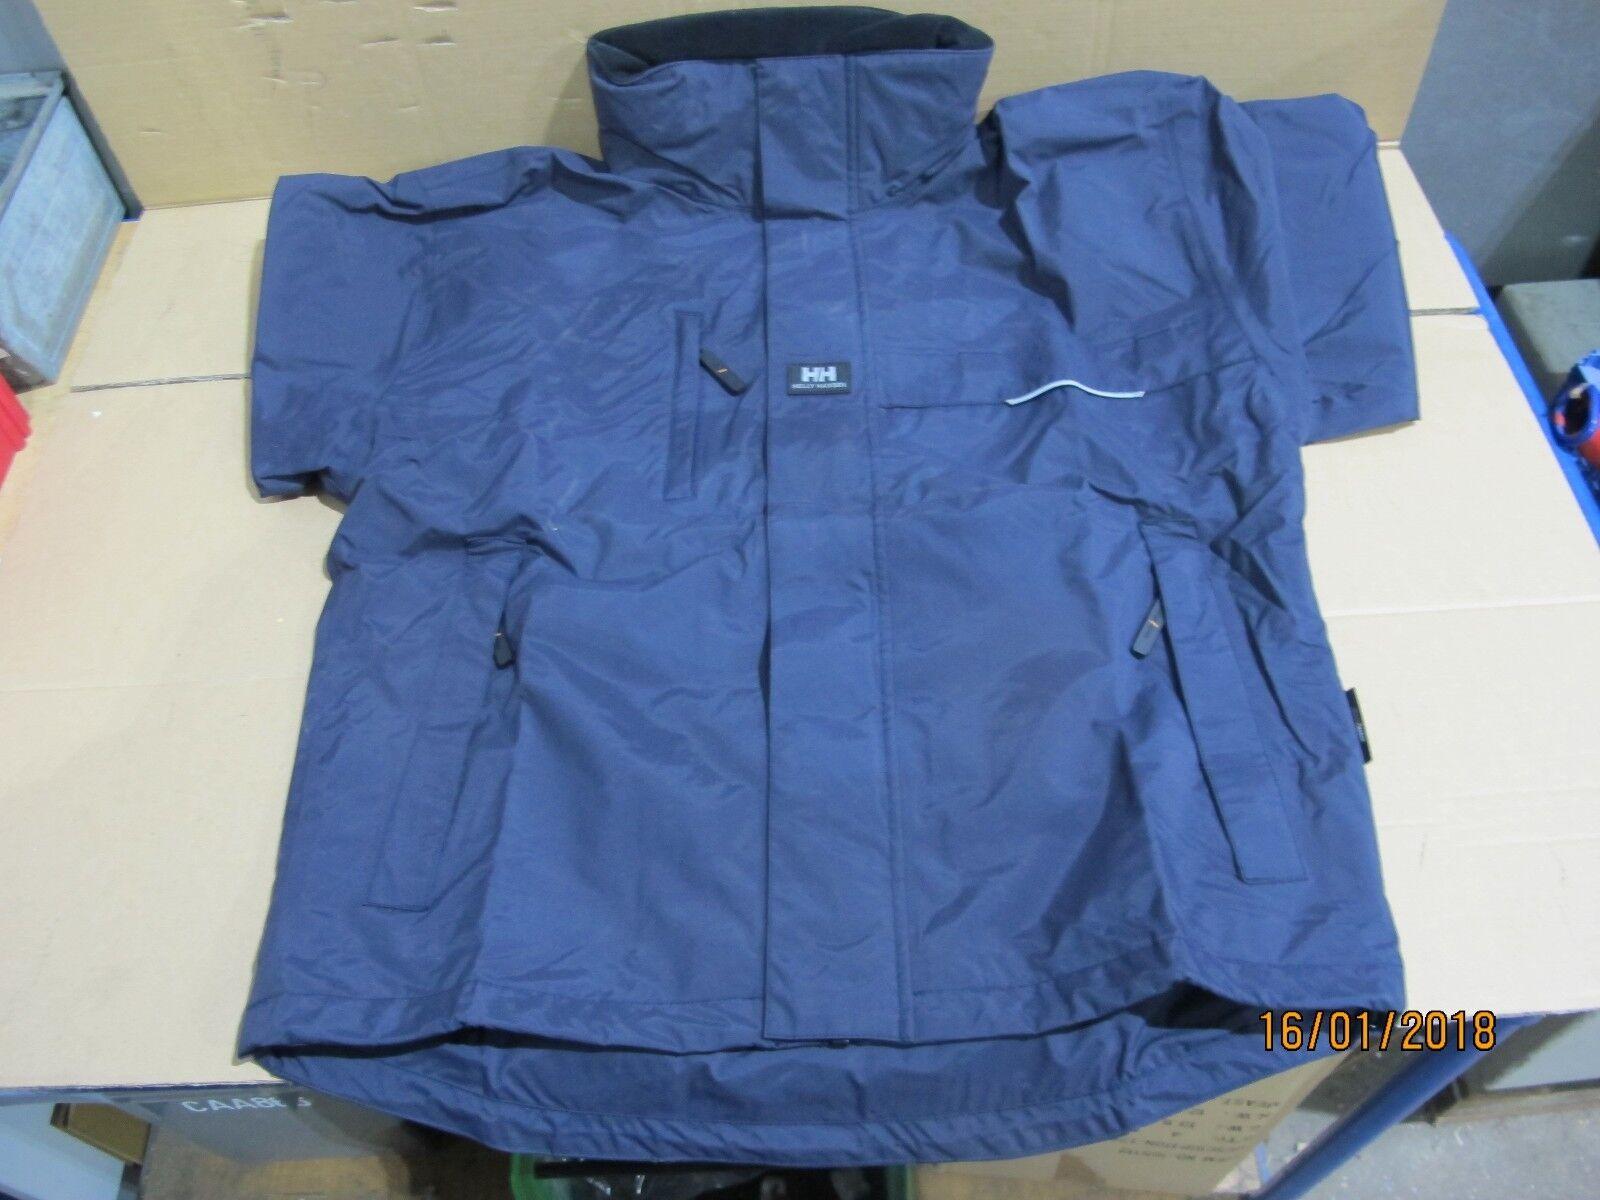 0232  Helly Hansen Regenjacke Outdoor Jacke Regenbekleidung Navy Blau